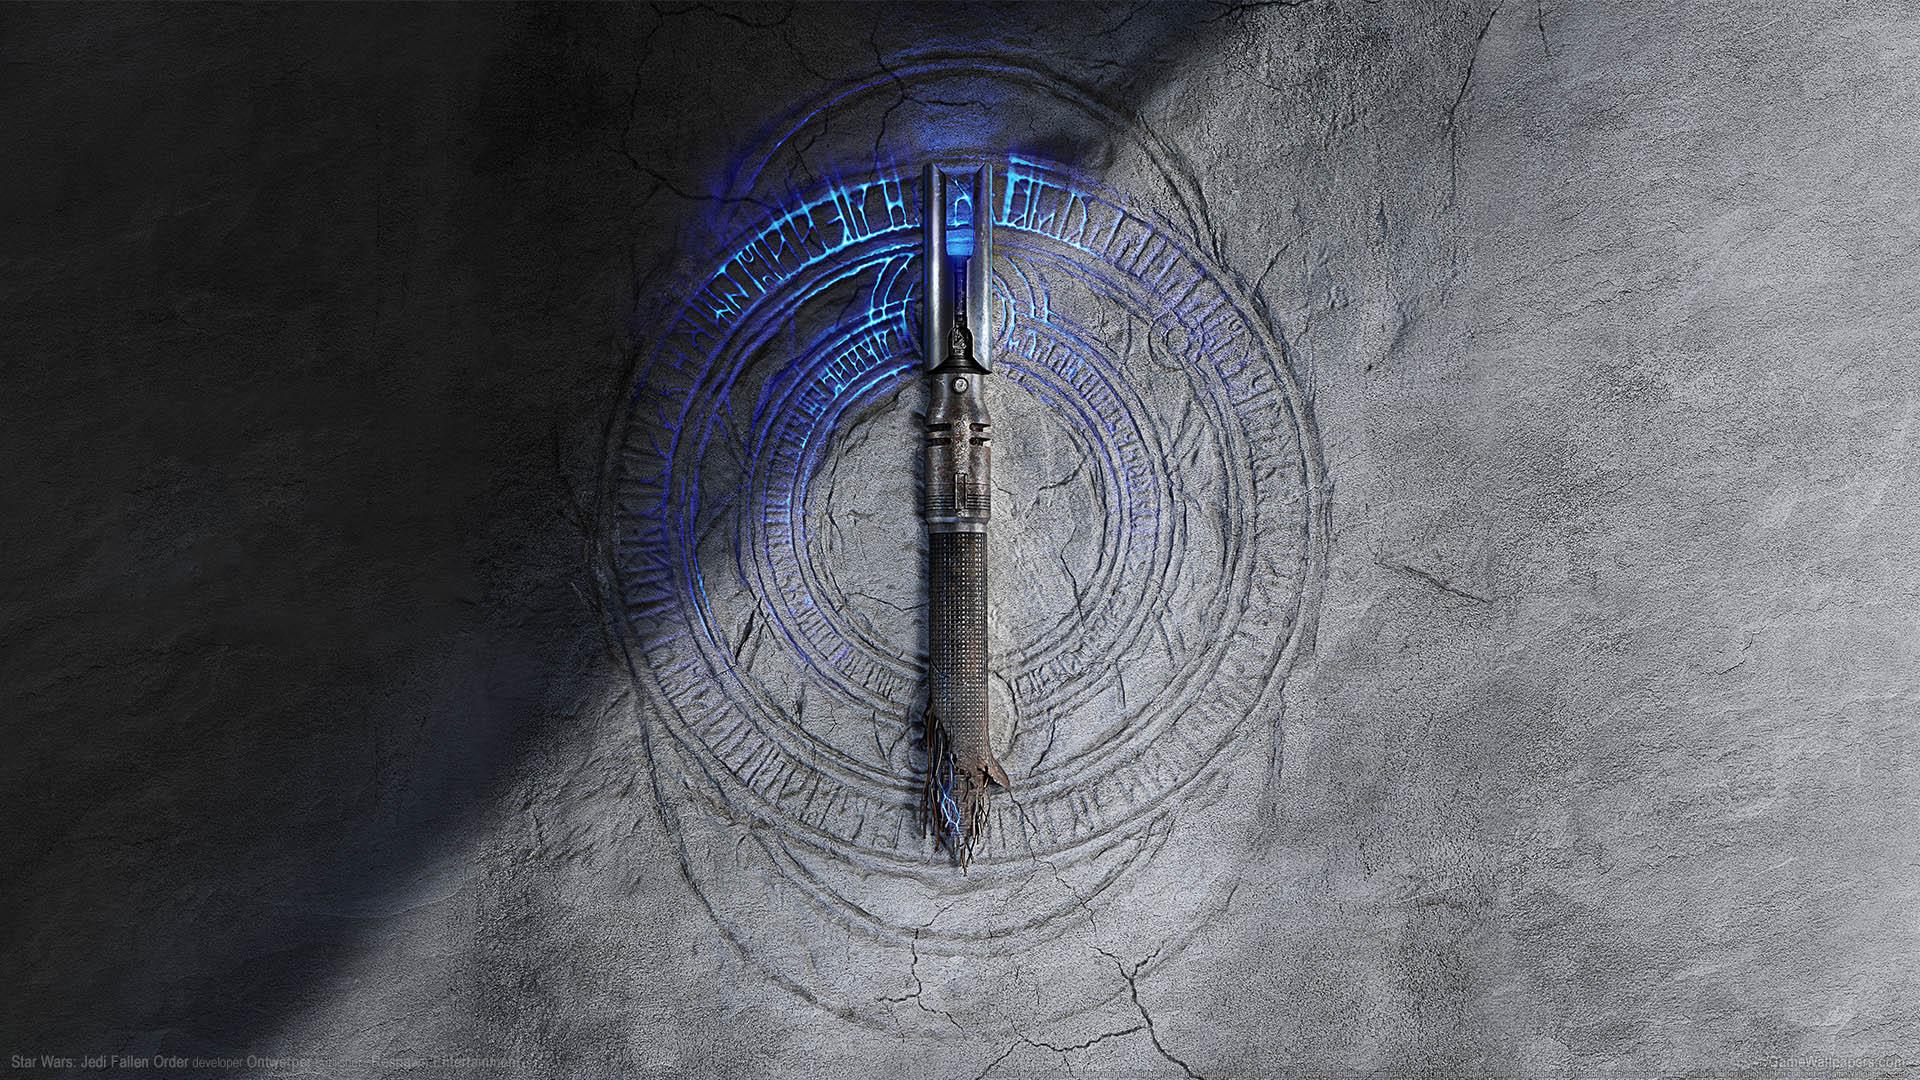 Star Wars Jedi: Fallen Order wallpaper 01 1920x1080